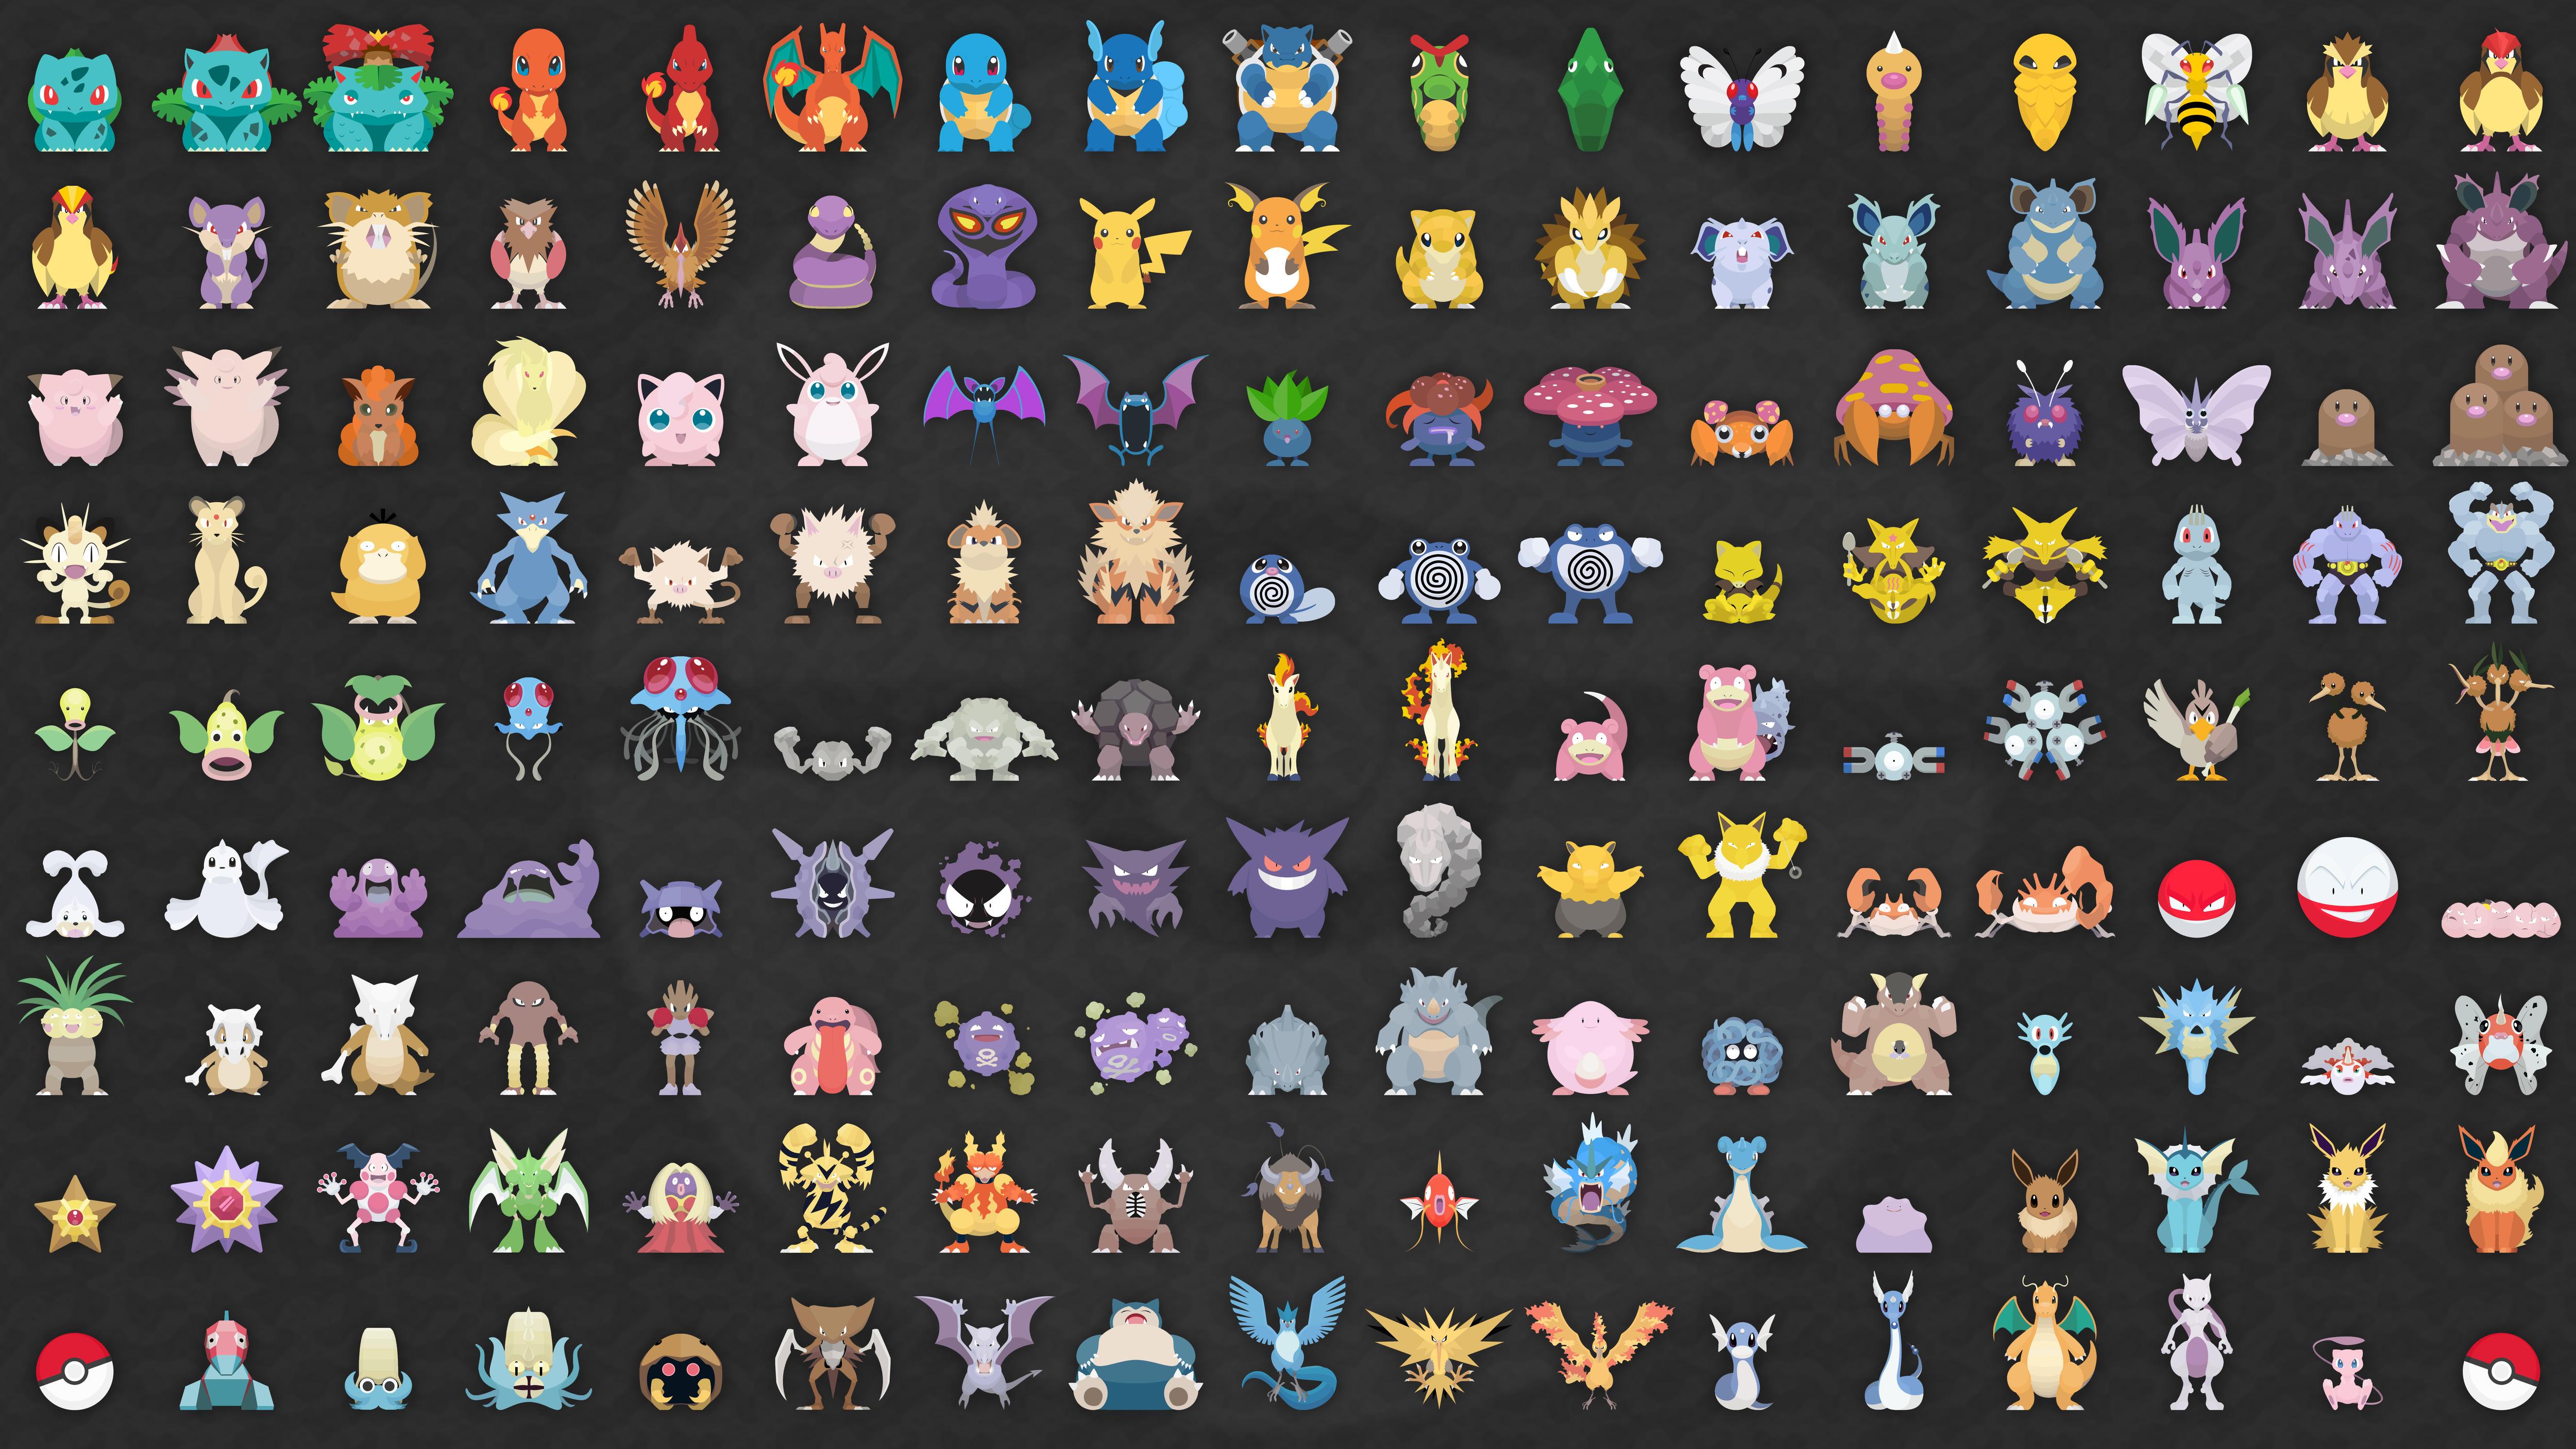 12 Pokemon Wallpaper by Drums12 on DeviantArt